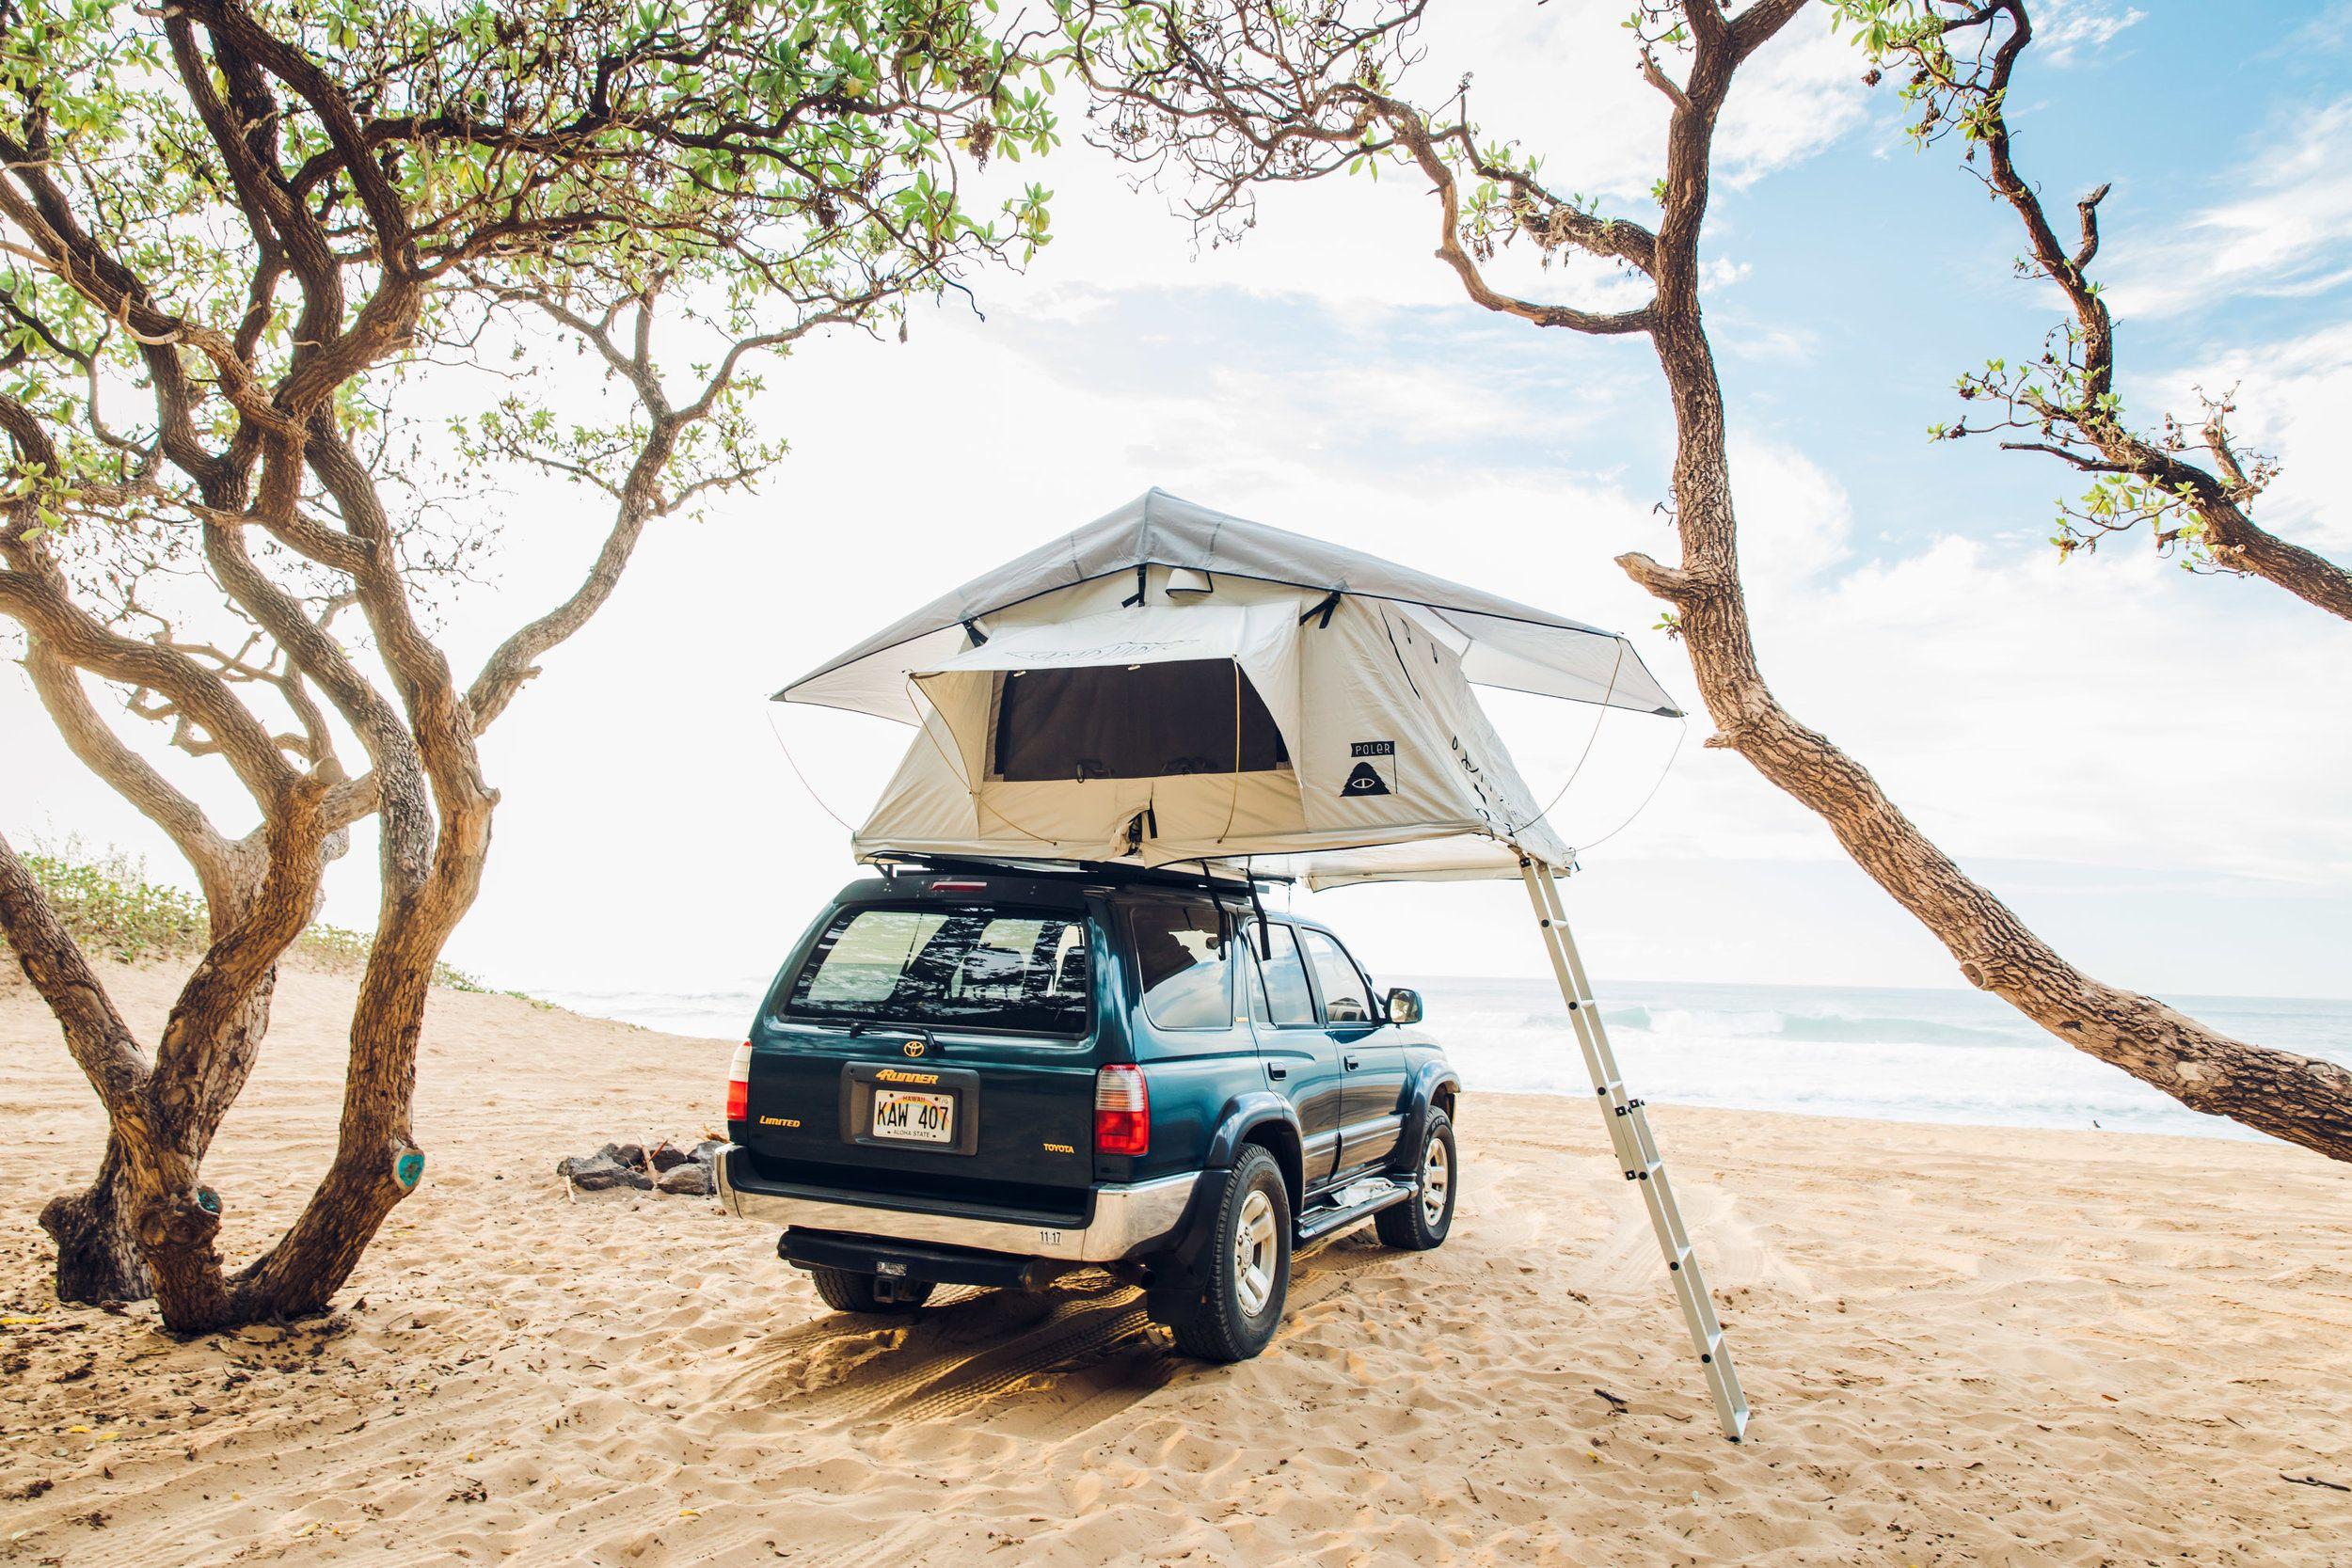 Polihale Overland-kauai-c&er-rental-roof top tent-hawaii.jpg & Polihale Overland-kauai-camper-rental-roof top tent-hawaii.jpg ...